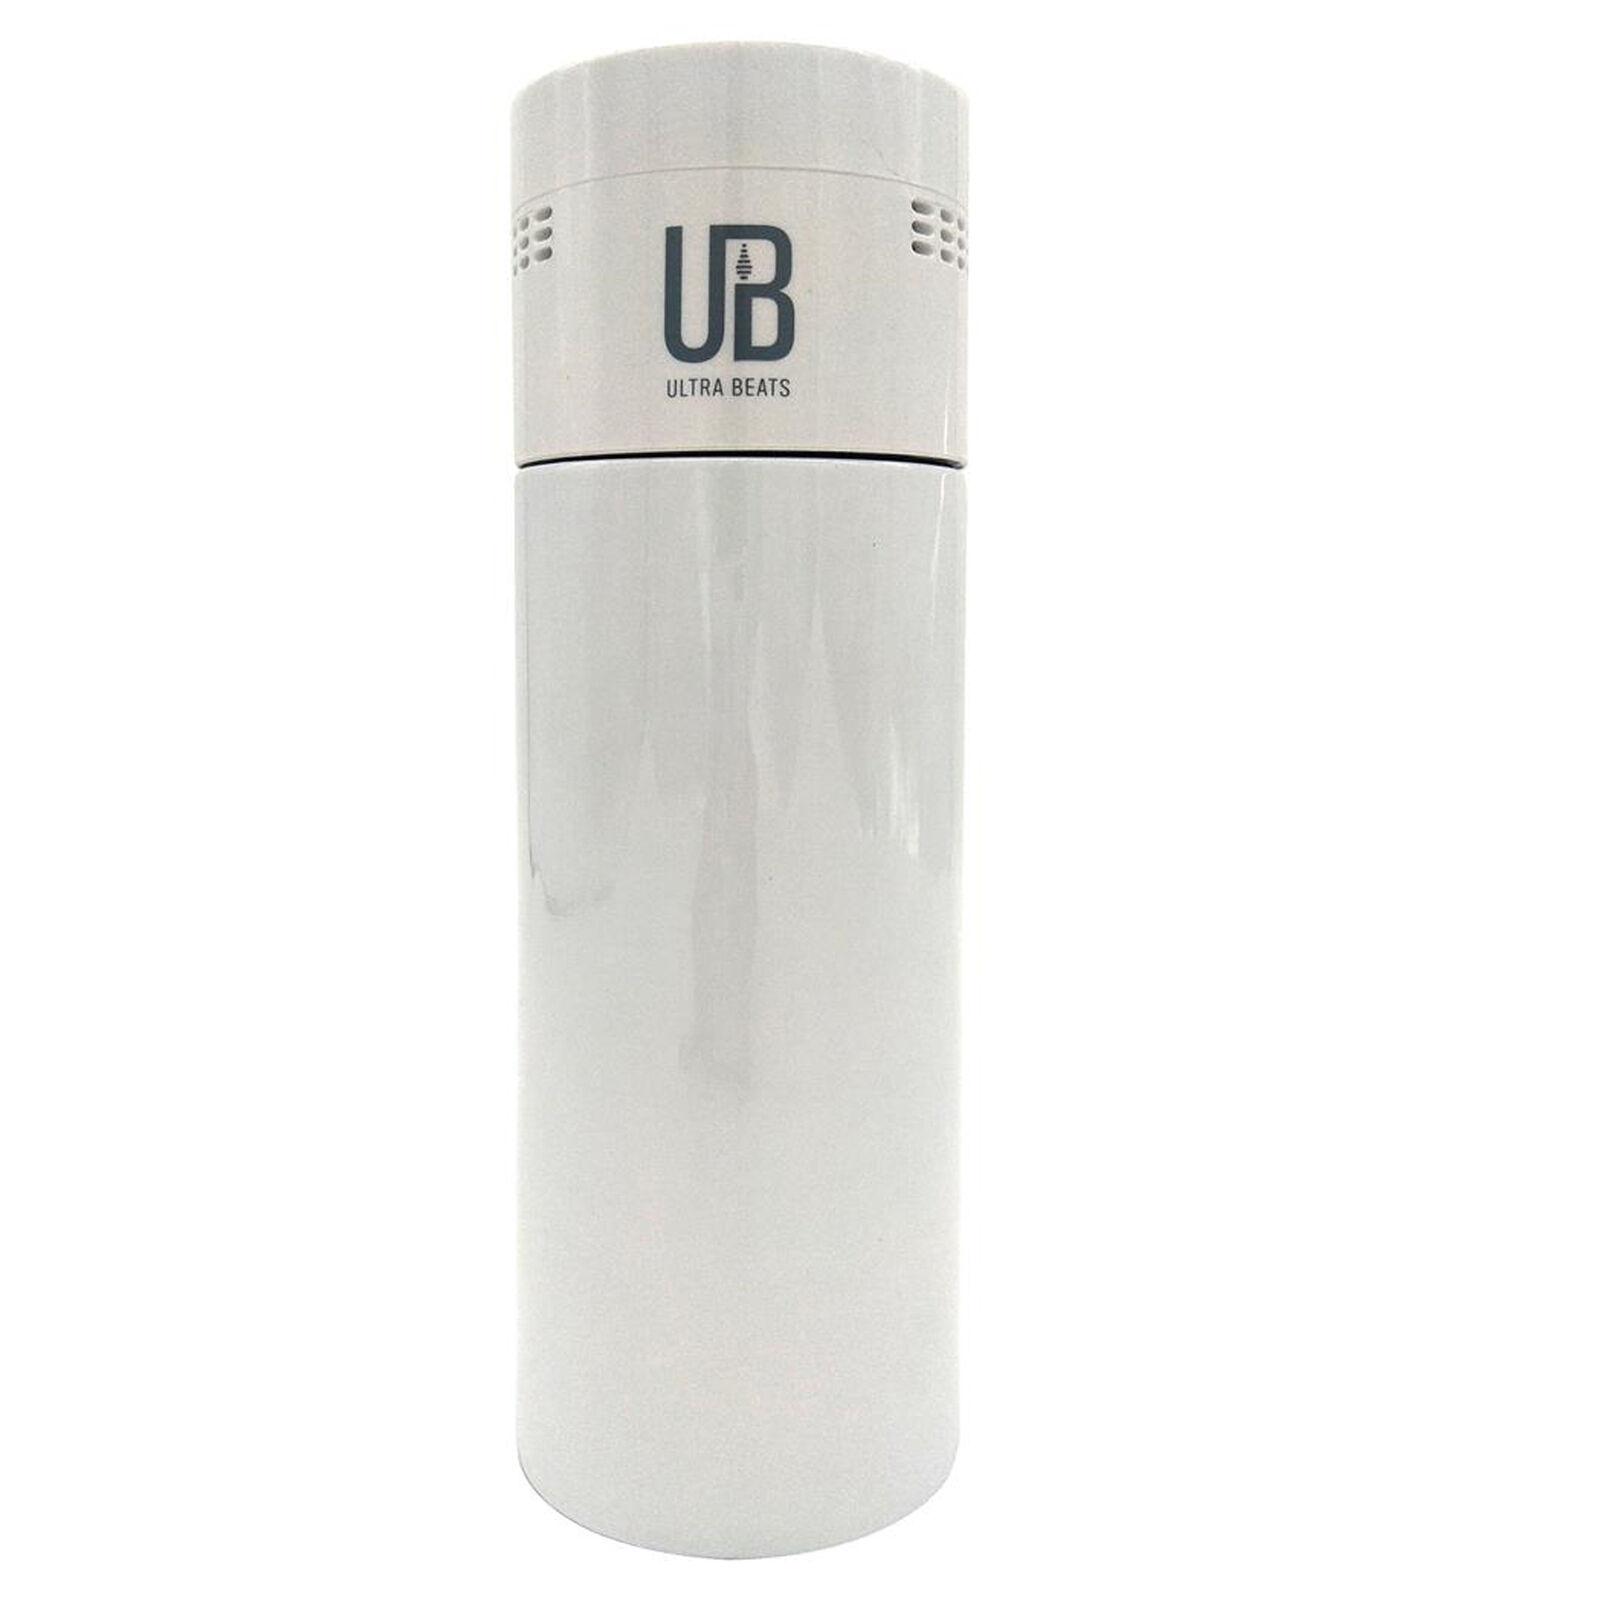 Ultra Beats 2in1 Stainless Steel Coffee Tumbler, Wireless Speaker, Alarm, bianca